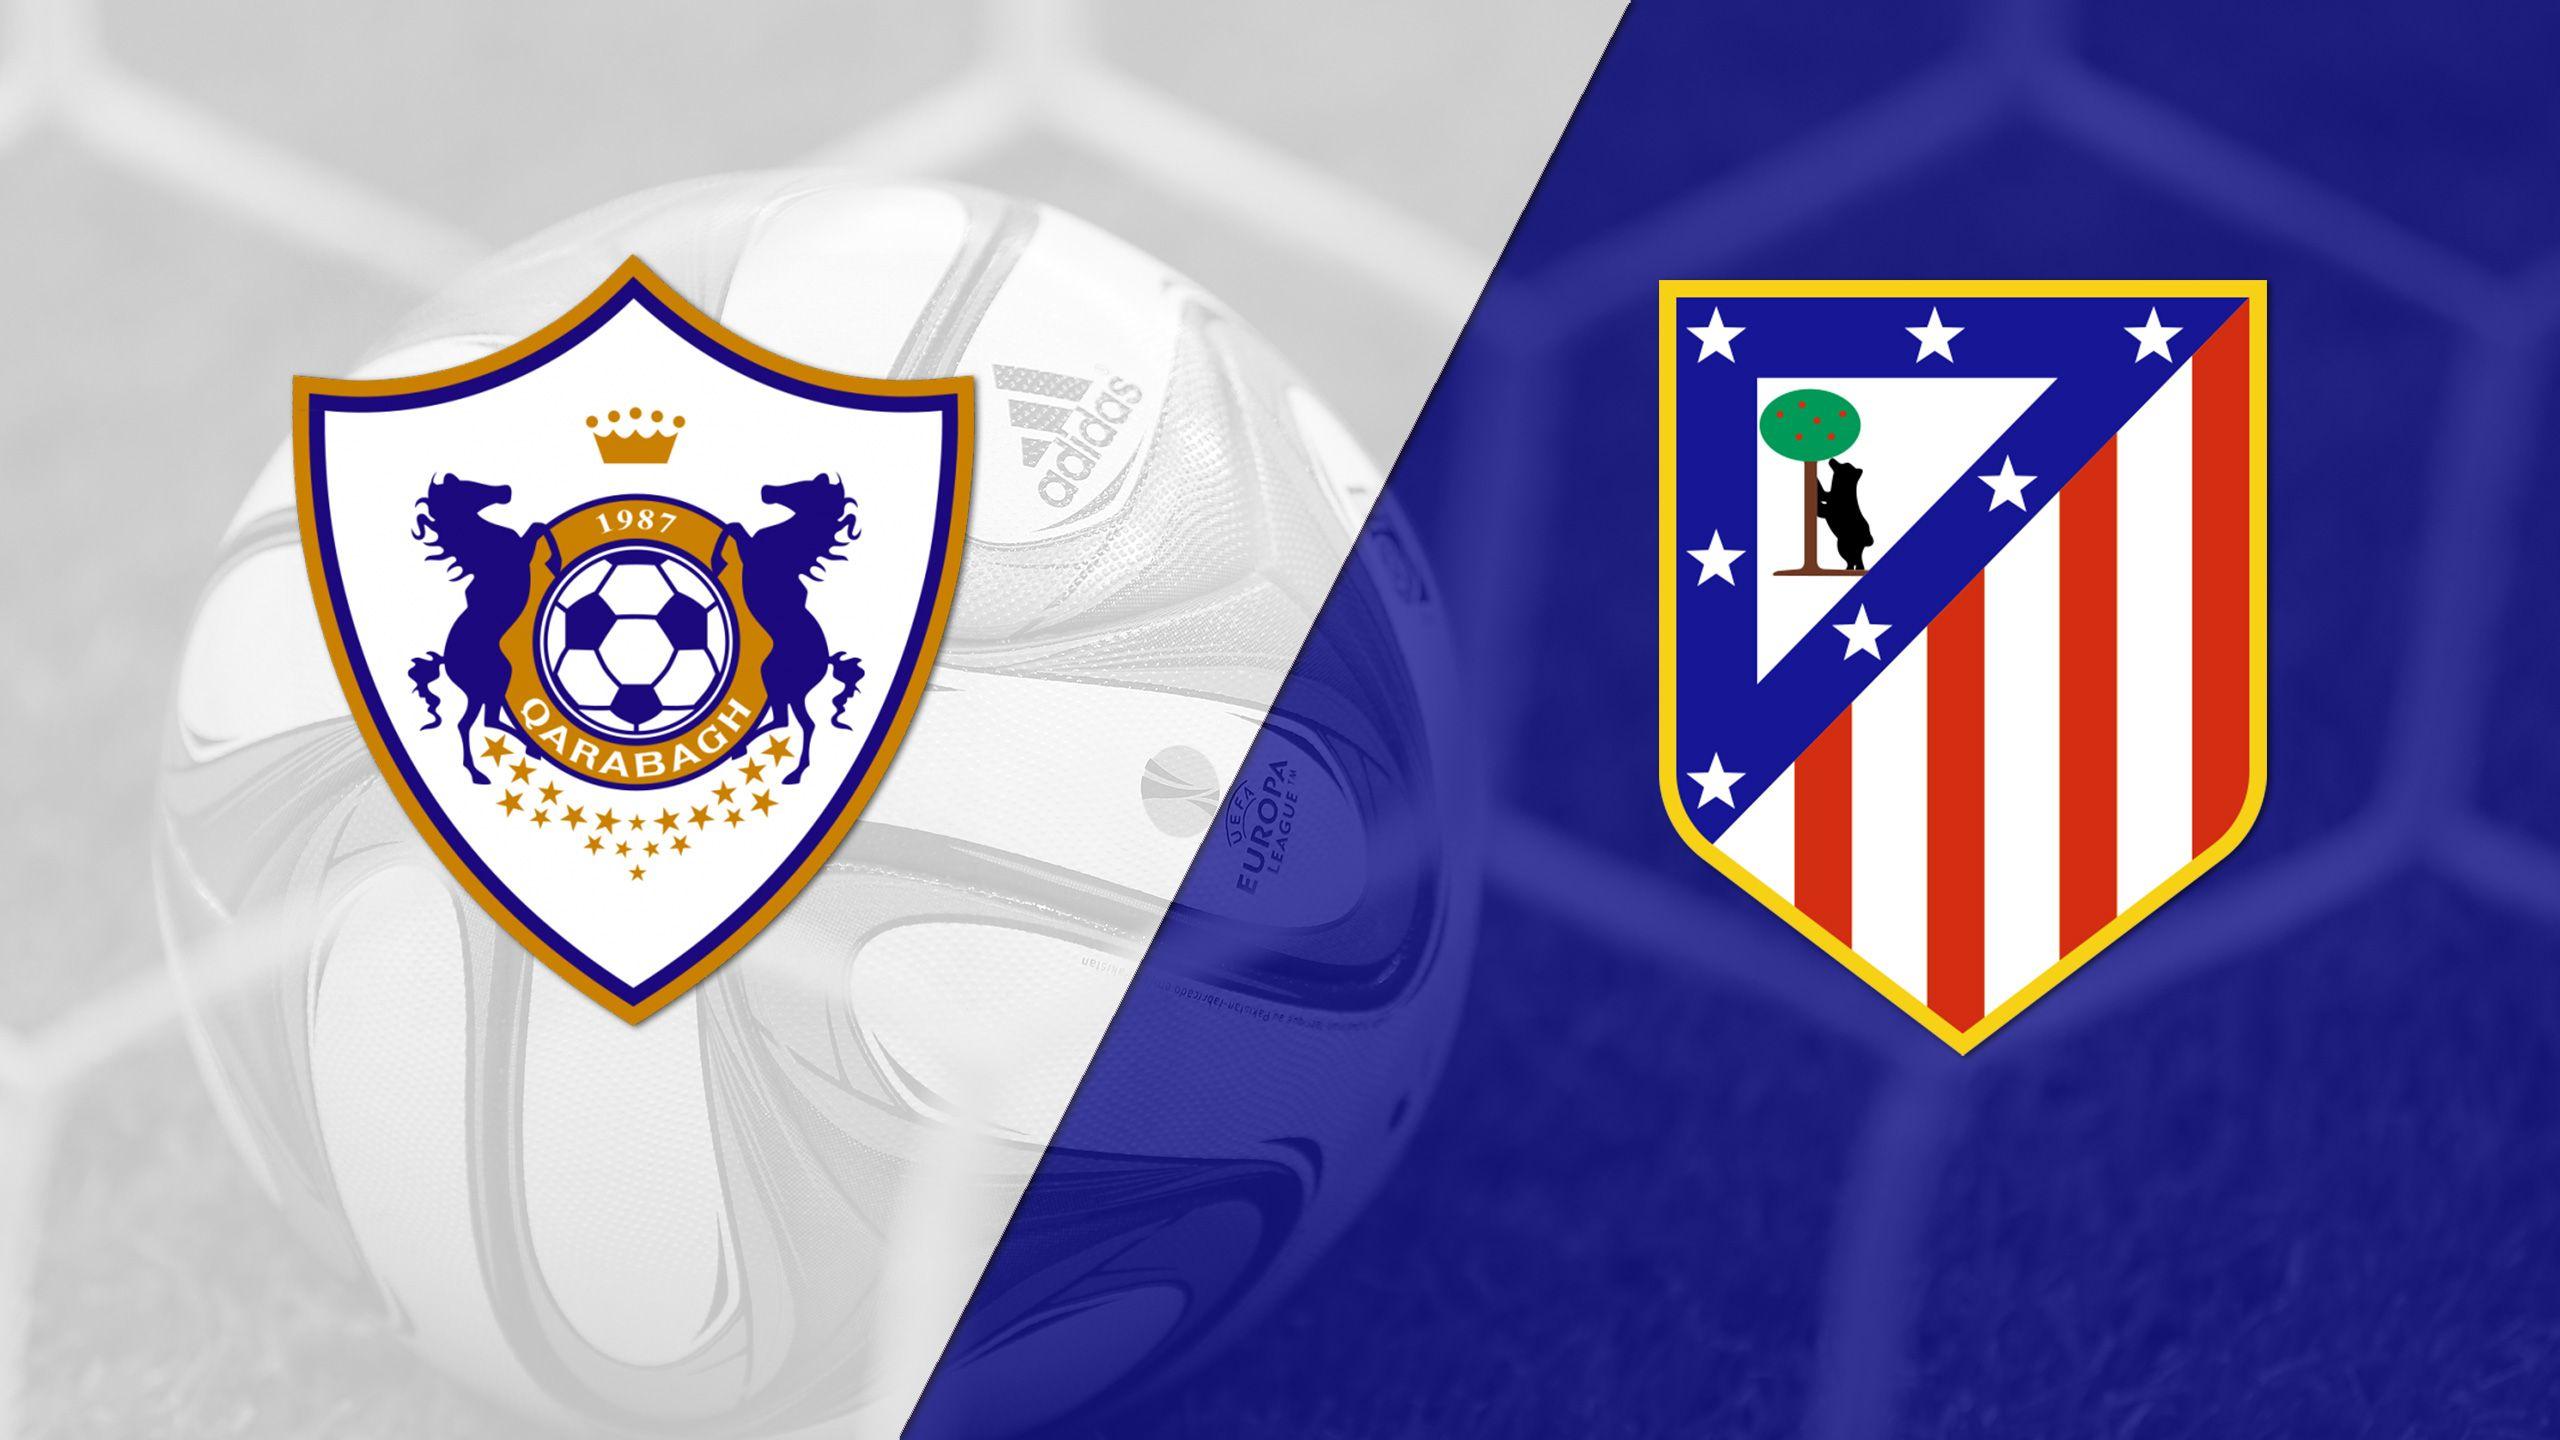 Qarabag vs. Atlético Madrid (Group Stage #3) (UEFA Champions League)